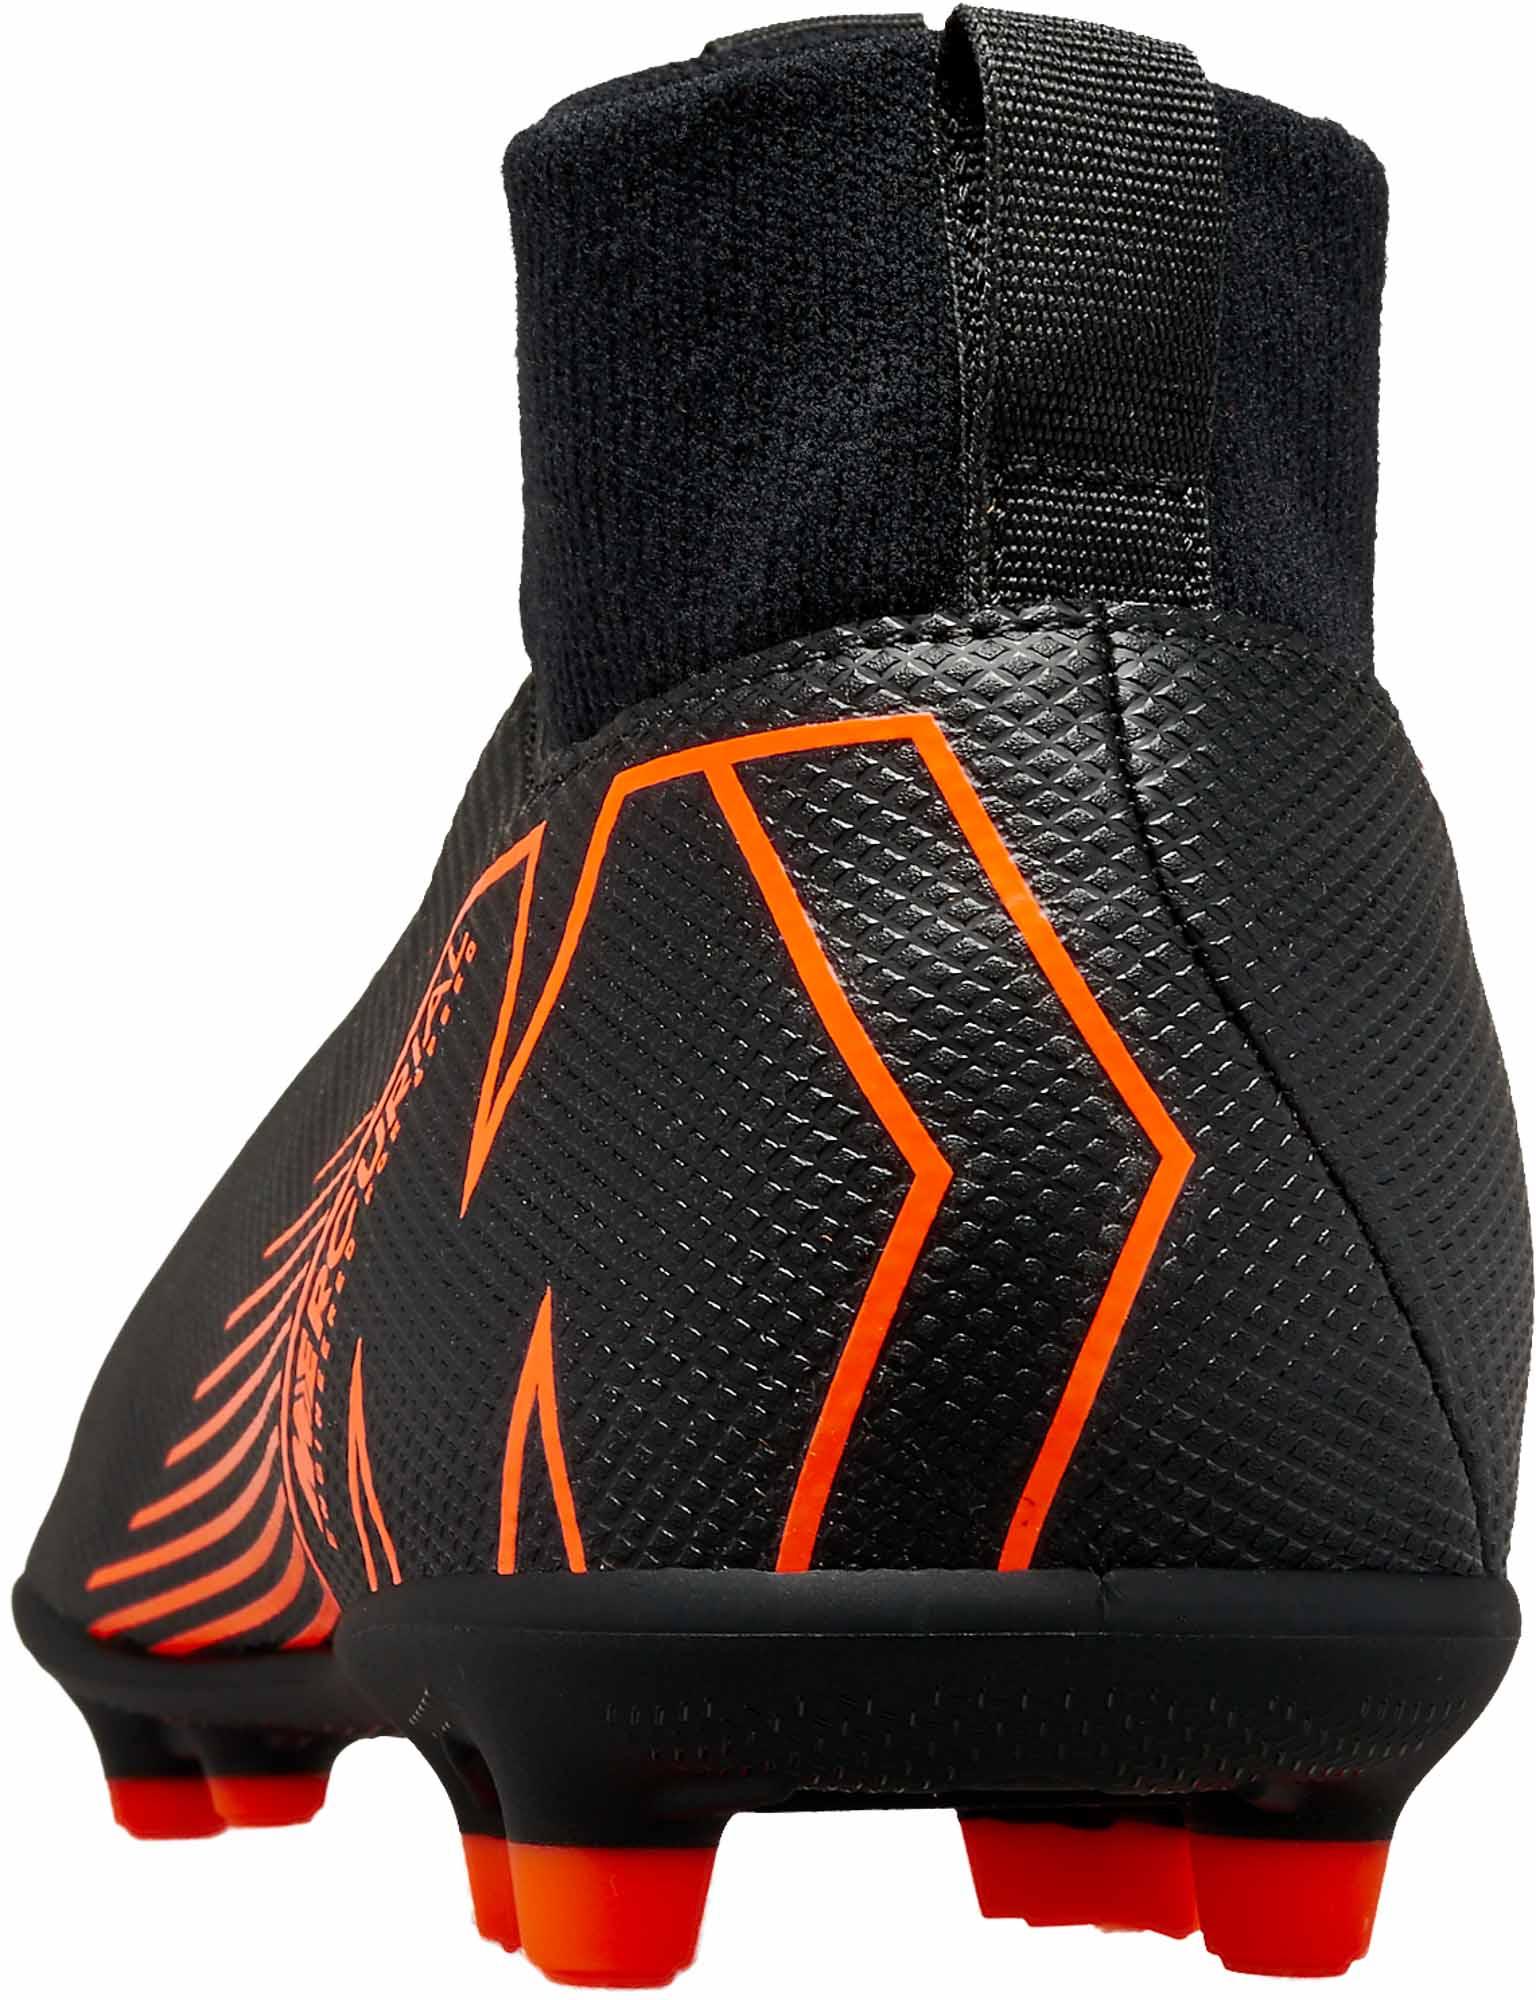 low cost 133c4 c0228 Nike Kids Superfly 6 Club MG - Black & Total Orange - Soccer ...